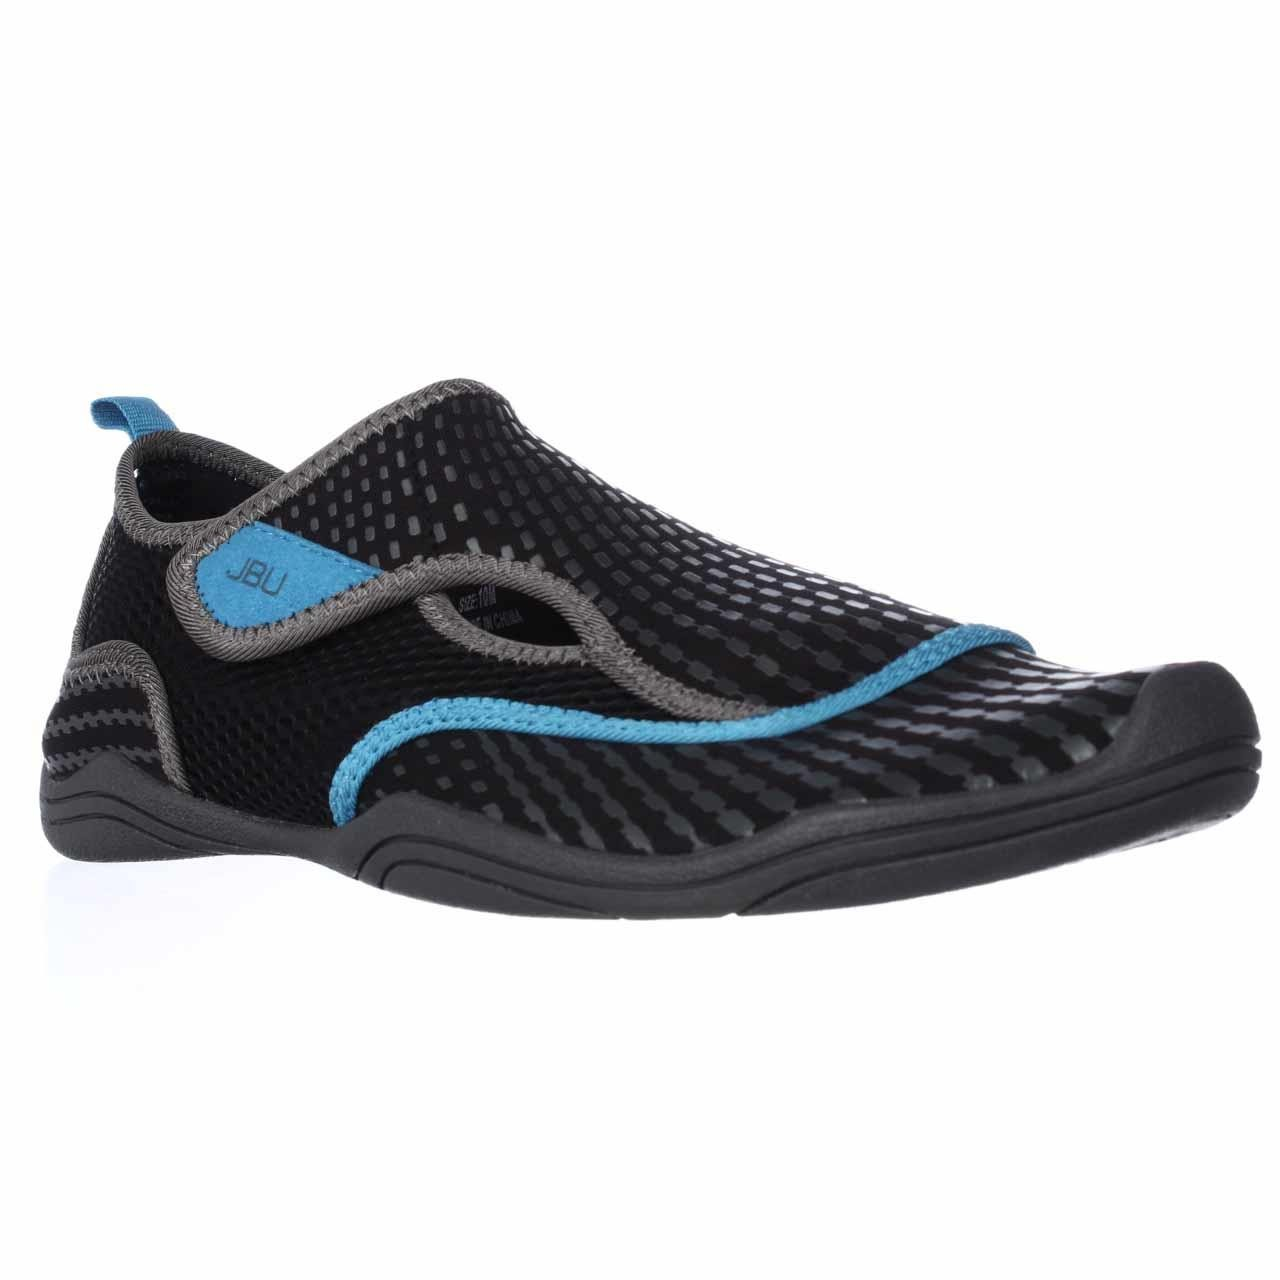 Jbu Men S Shoes